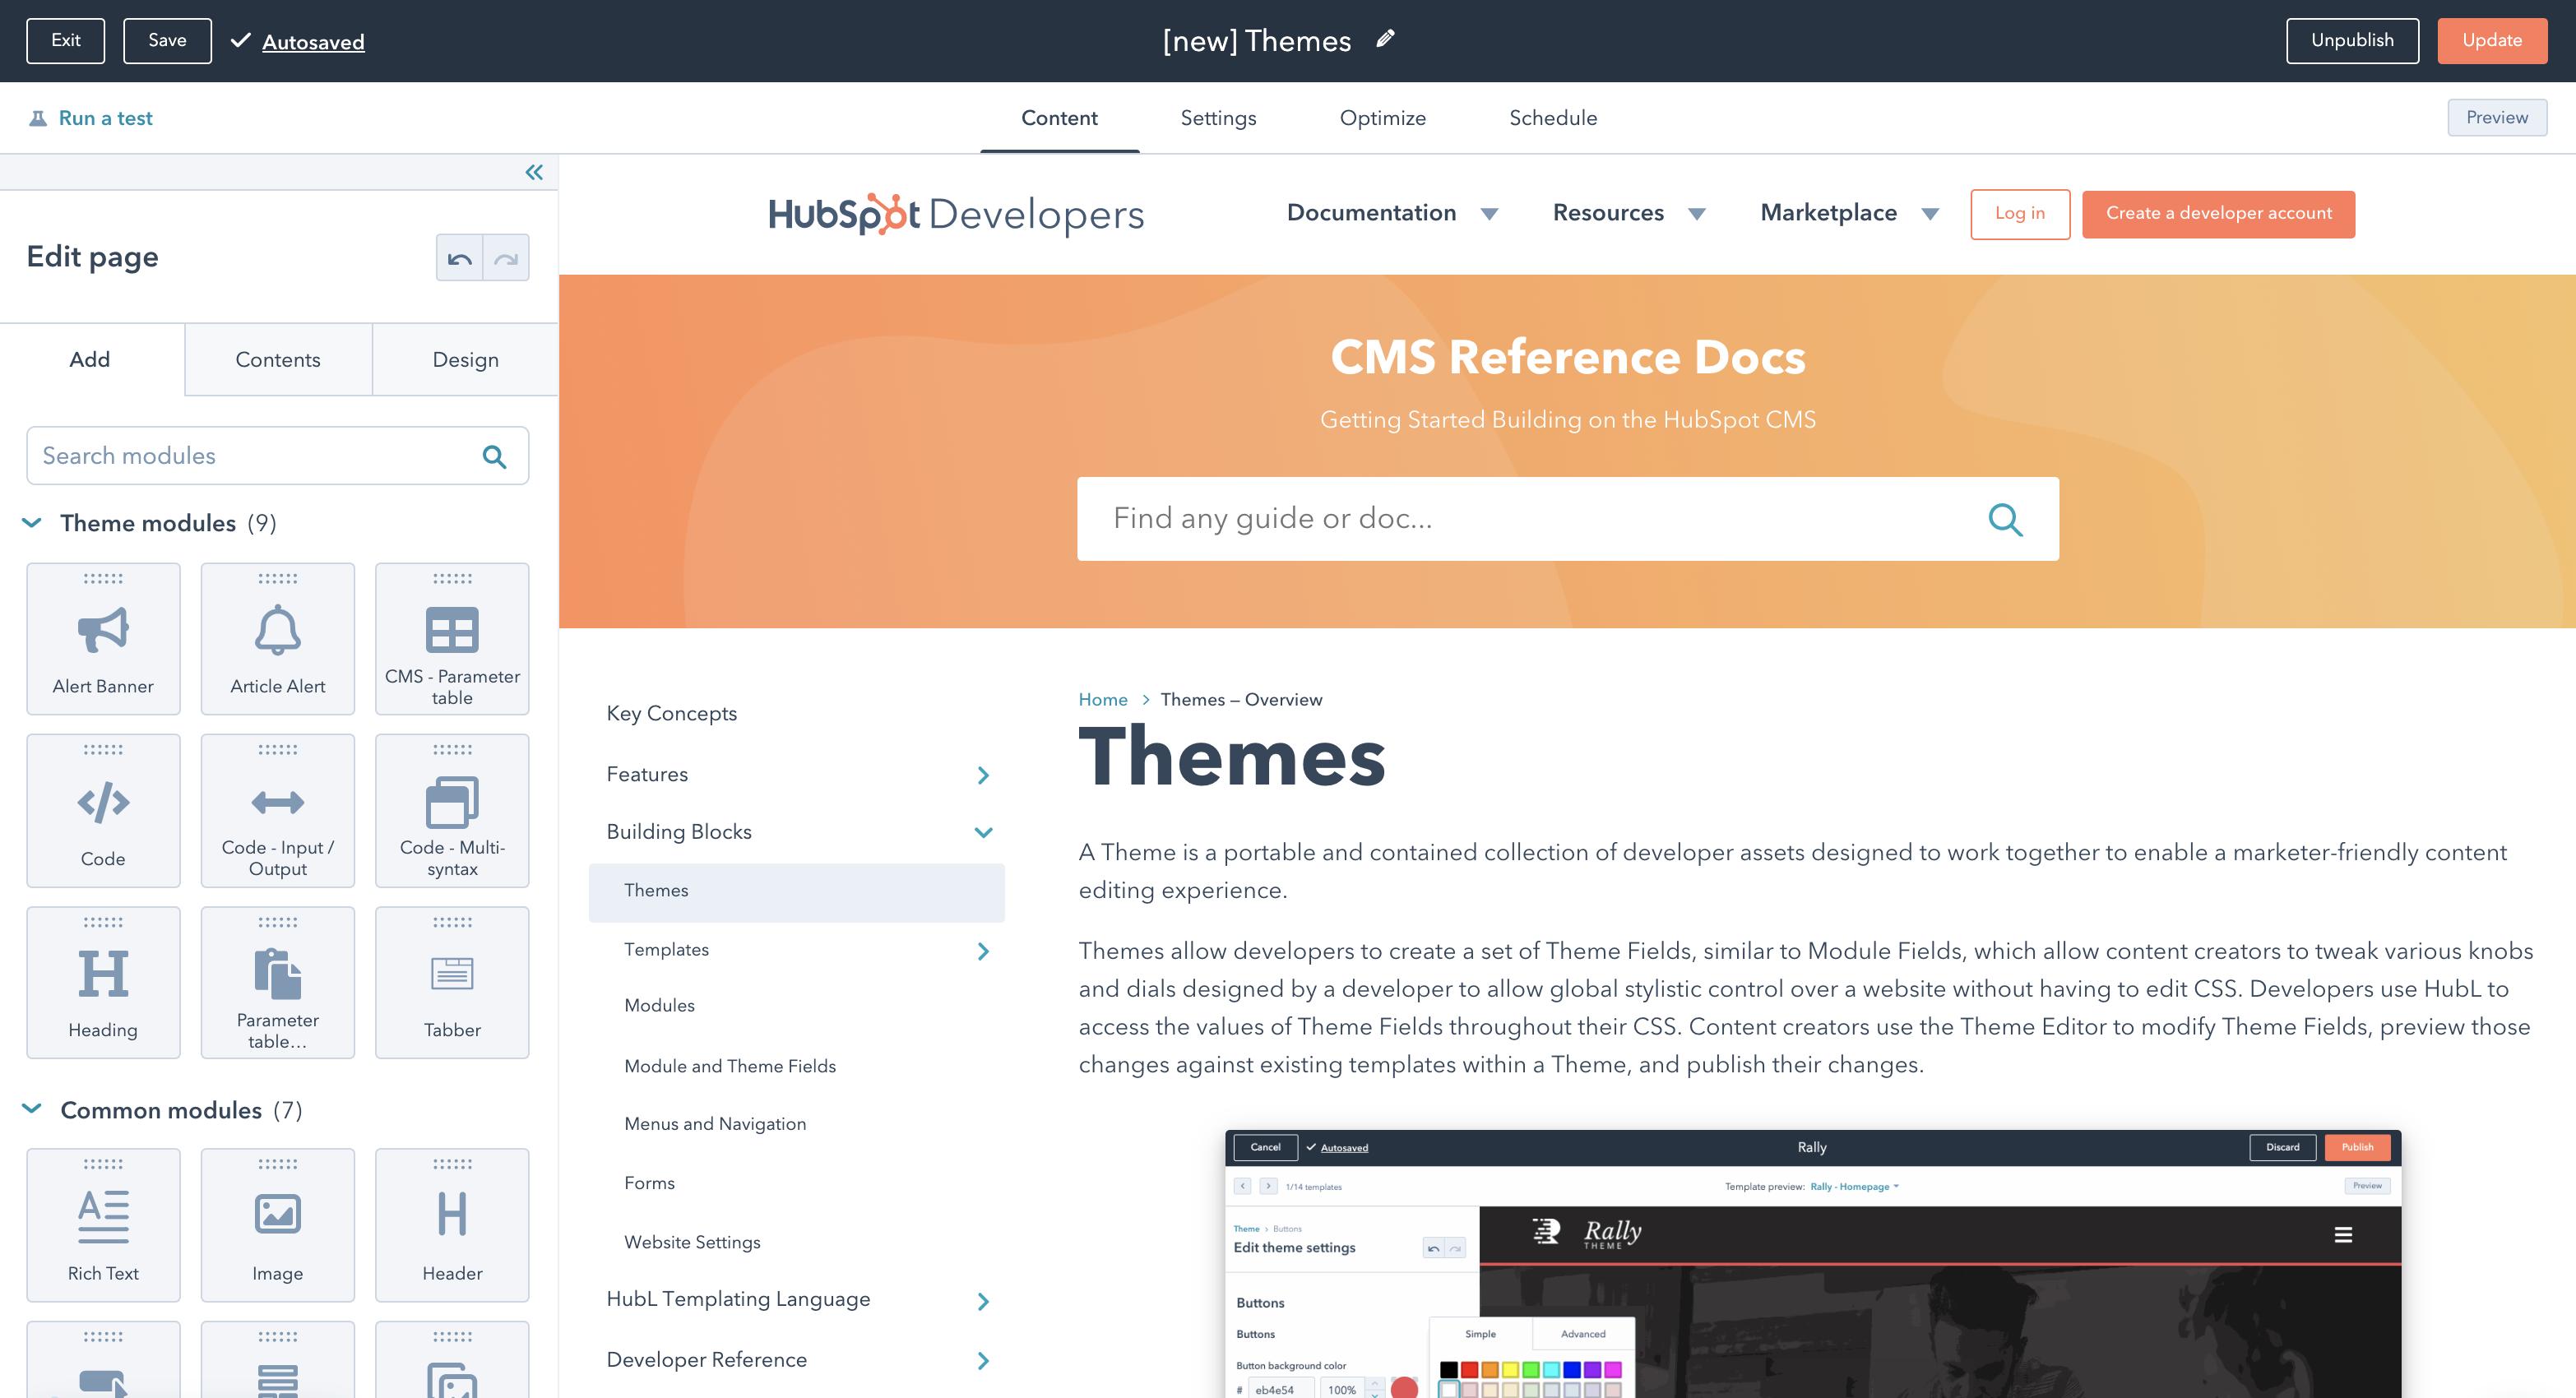 Theme modules inside of a theme